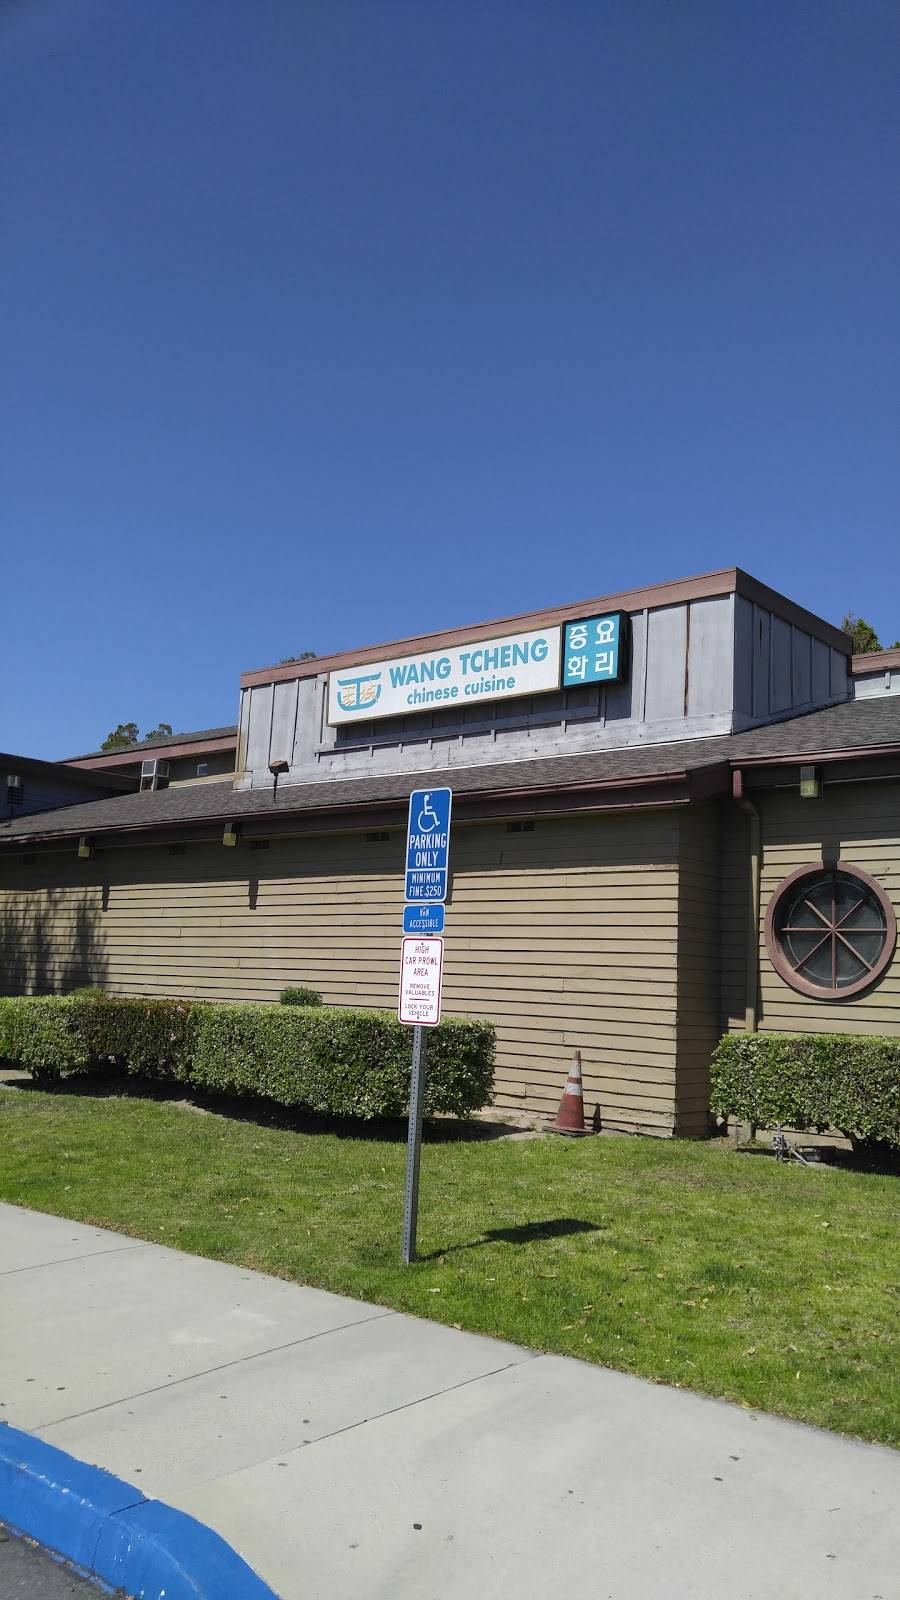 Wang Tcheng Chinese Restaurant | restaurant | 1199 N Euclid St, Anaheim, CA 92801, USA | 7147789988 OR +1 714-778-9988